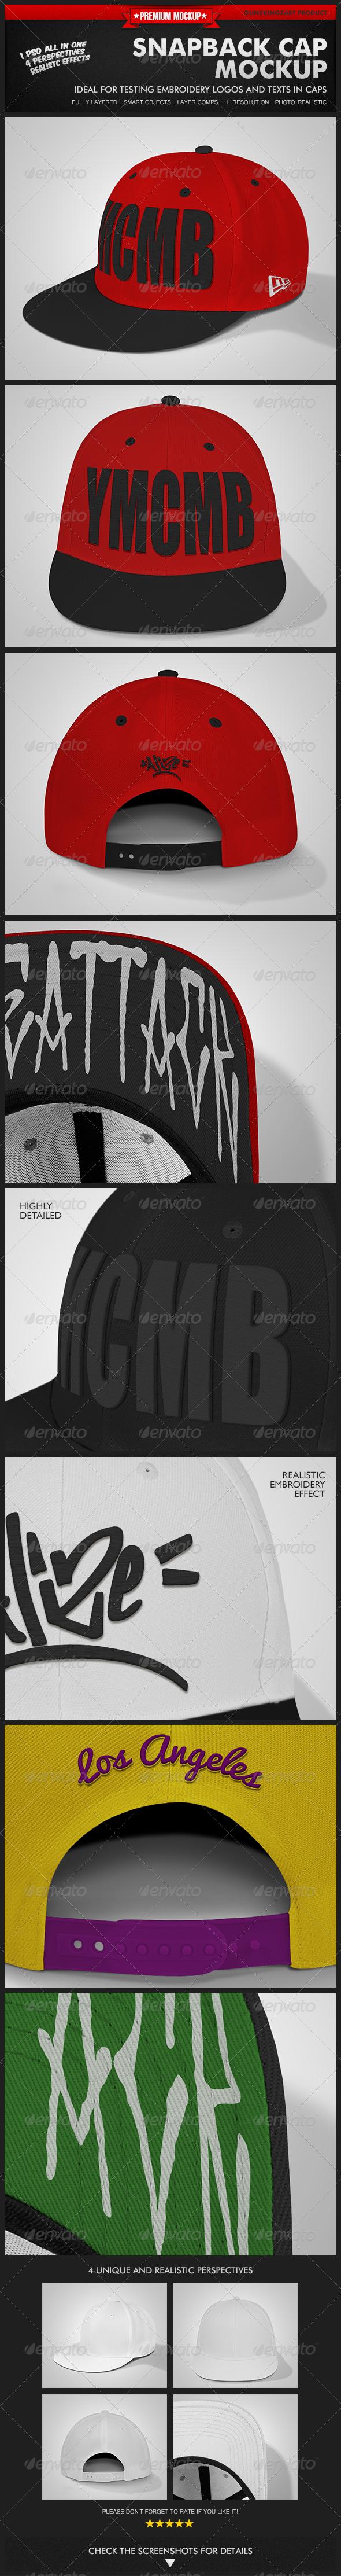 Graphicriver   Snapback Cap Mockup Free Download free download Graphicriver   Snapback Cap Mockup Free Download nulled Graphicriver   Snapback Cap Mockup Free Download